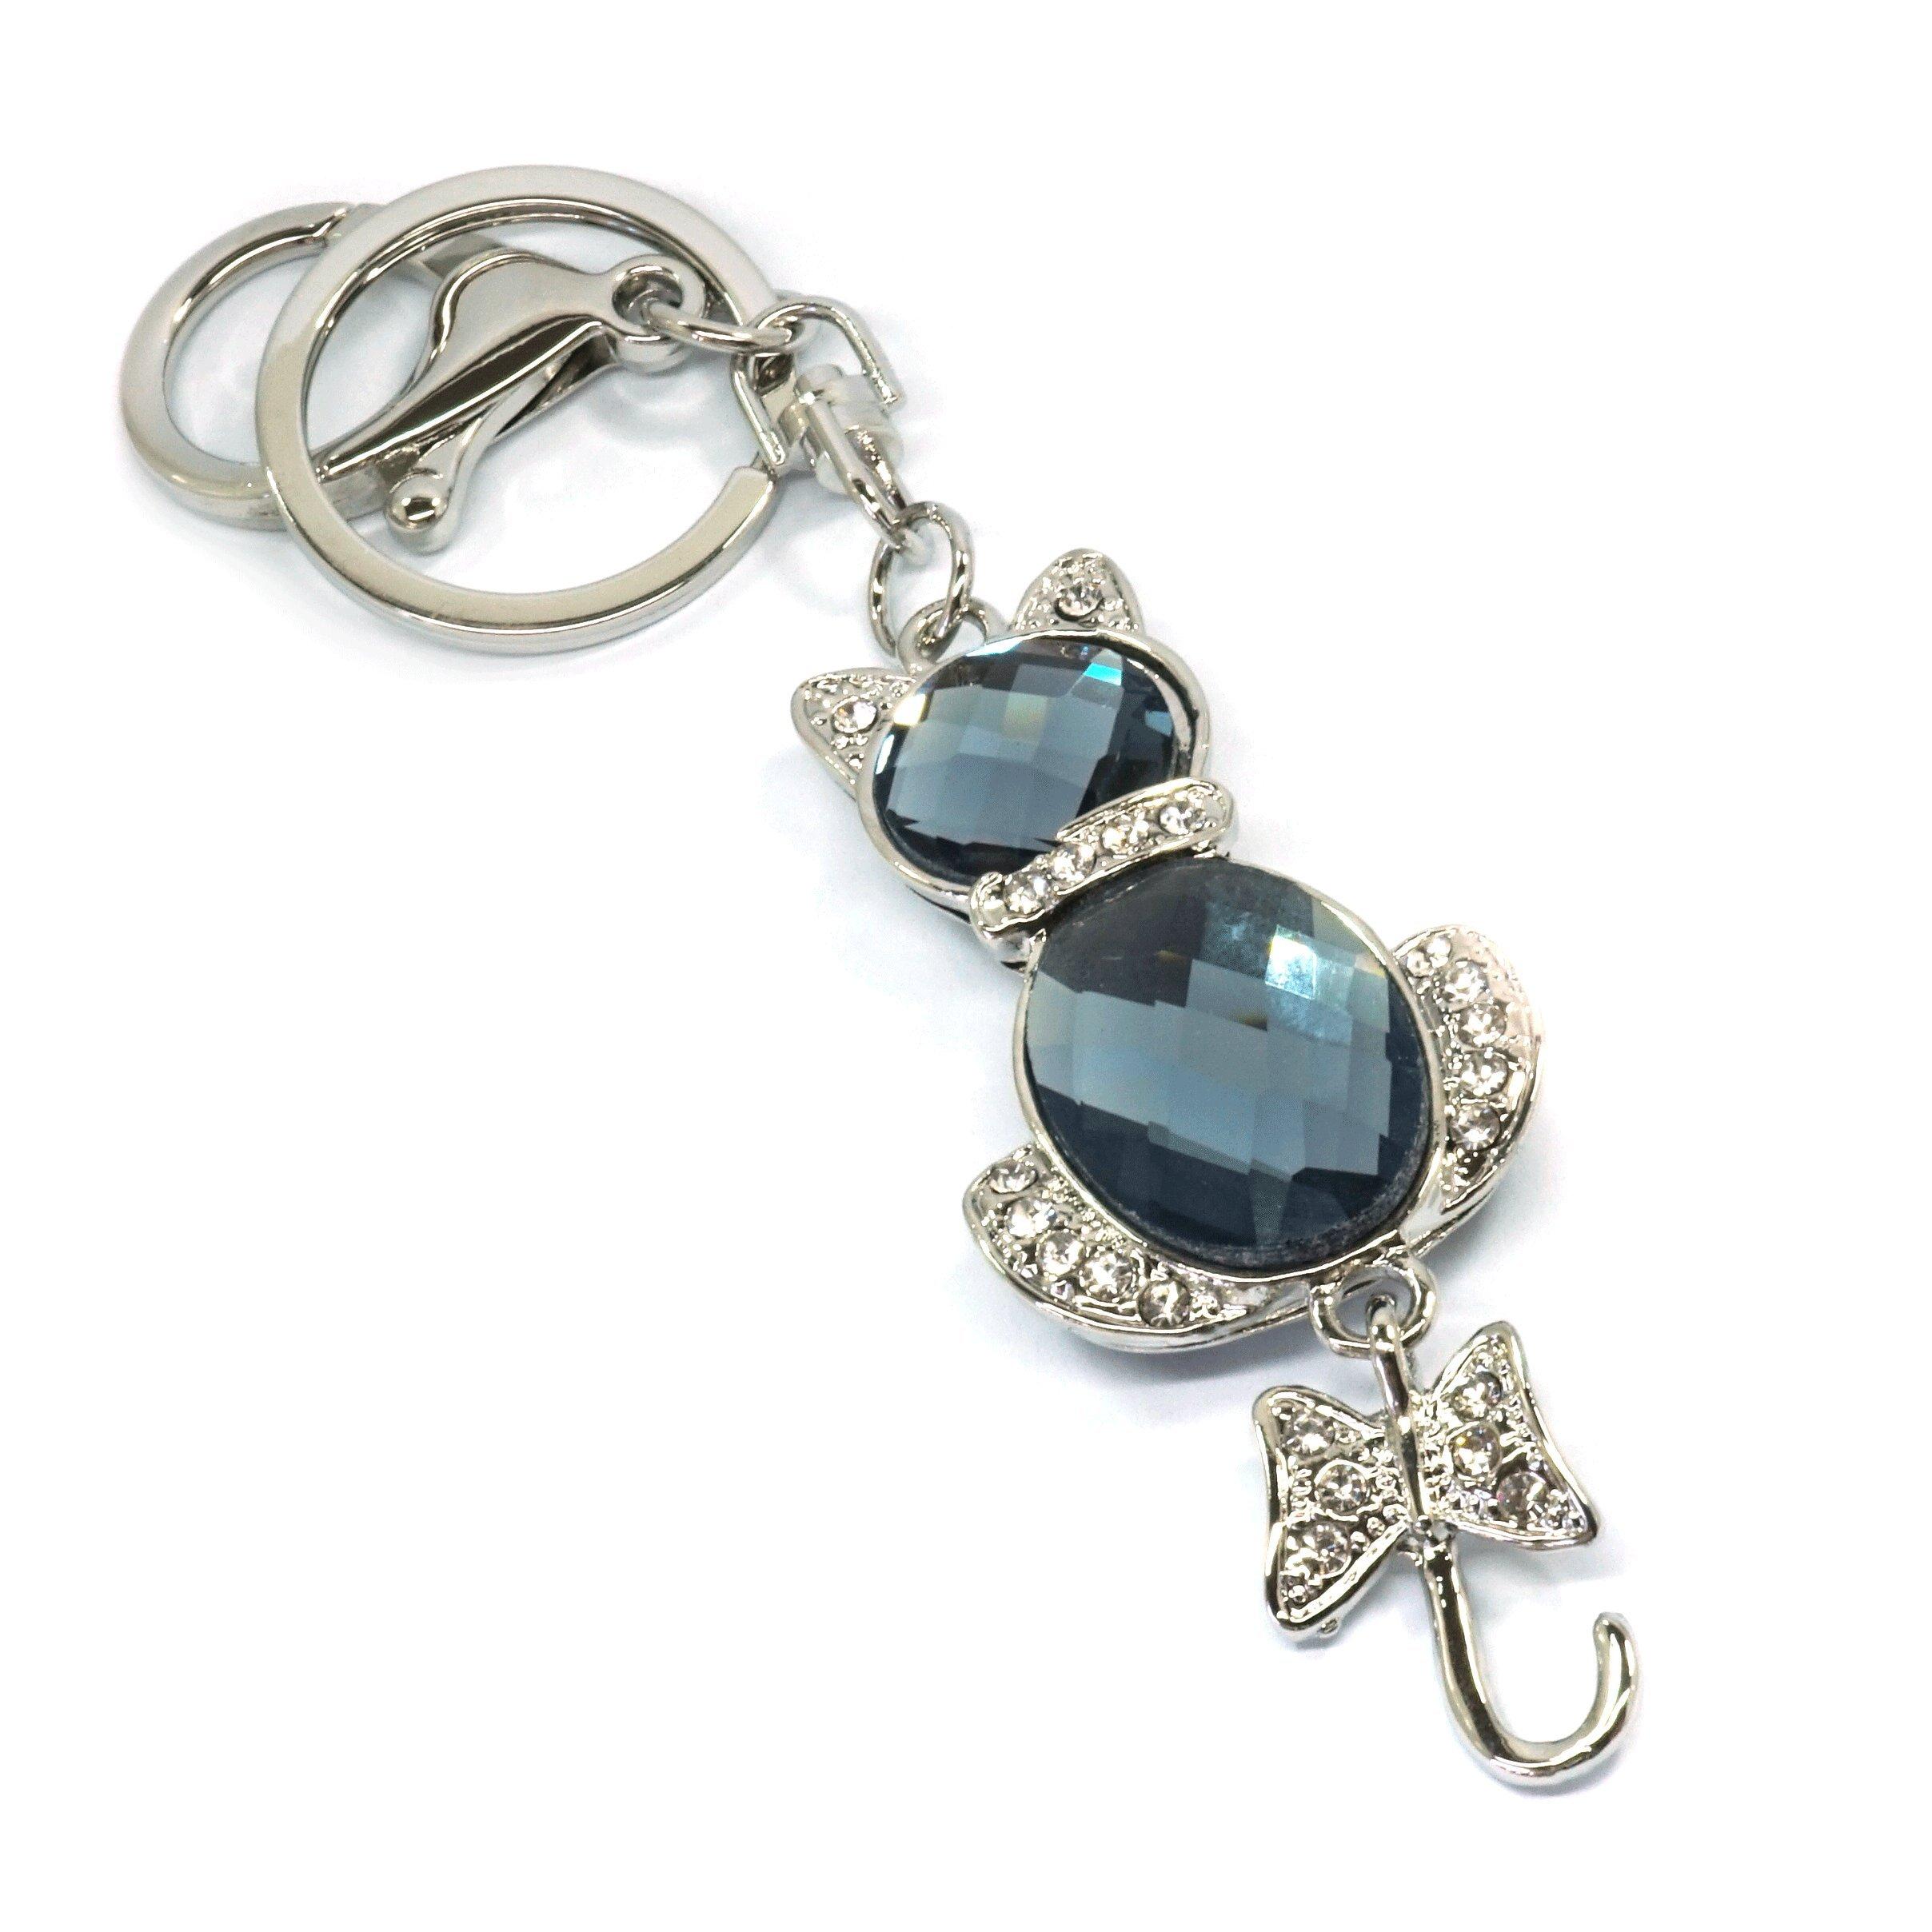 Teri's Boutique Cat Kitty Love Animal Cute Ribbon Tail Rhinestone Jewel Keychain (Silver)